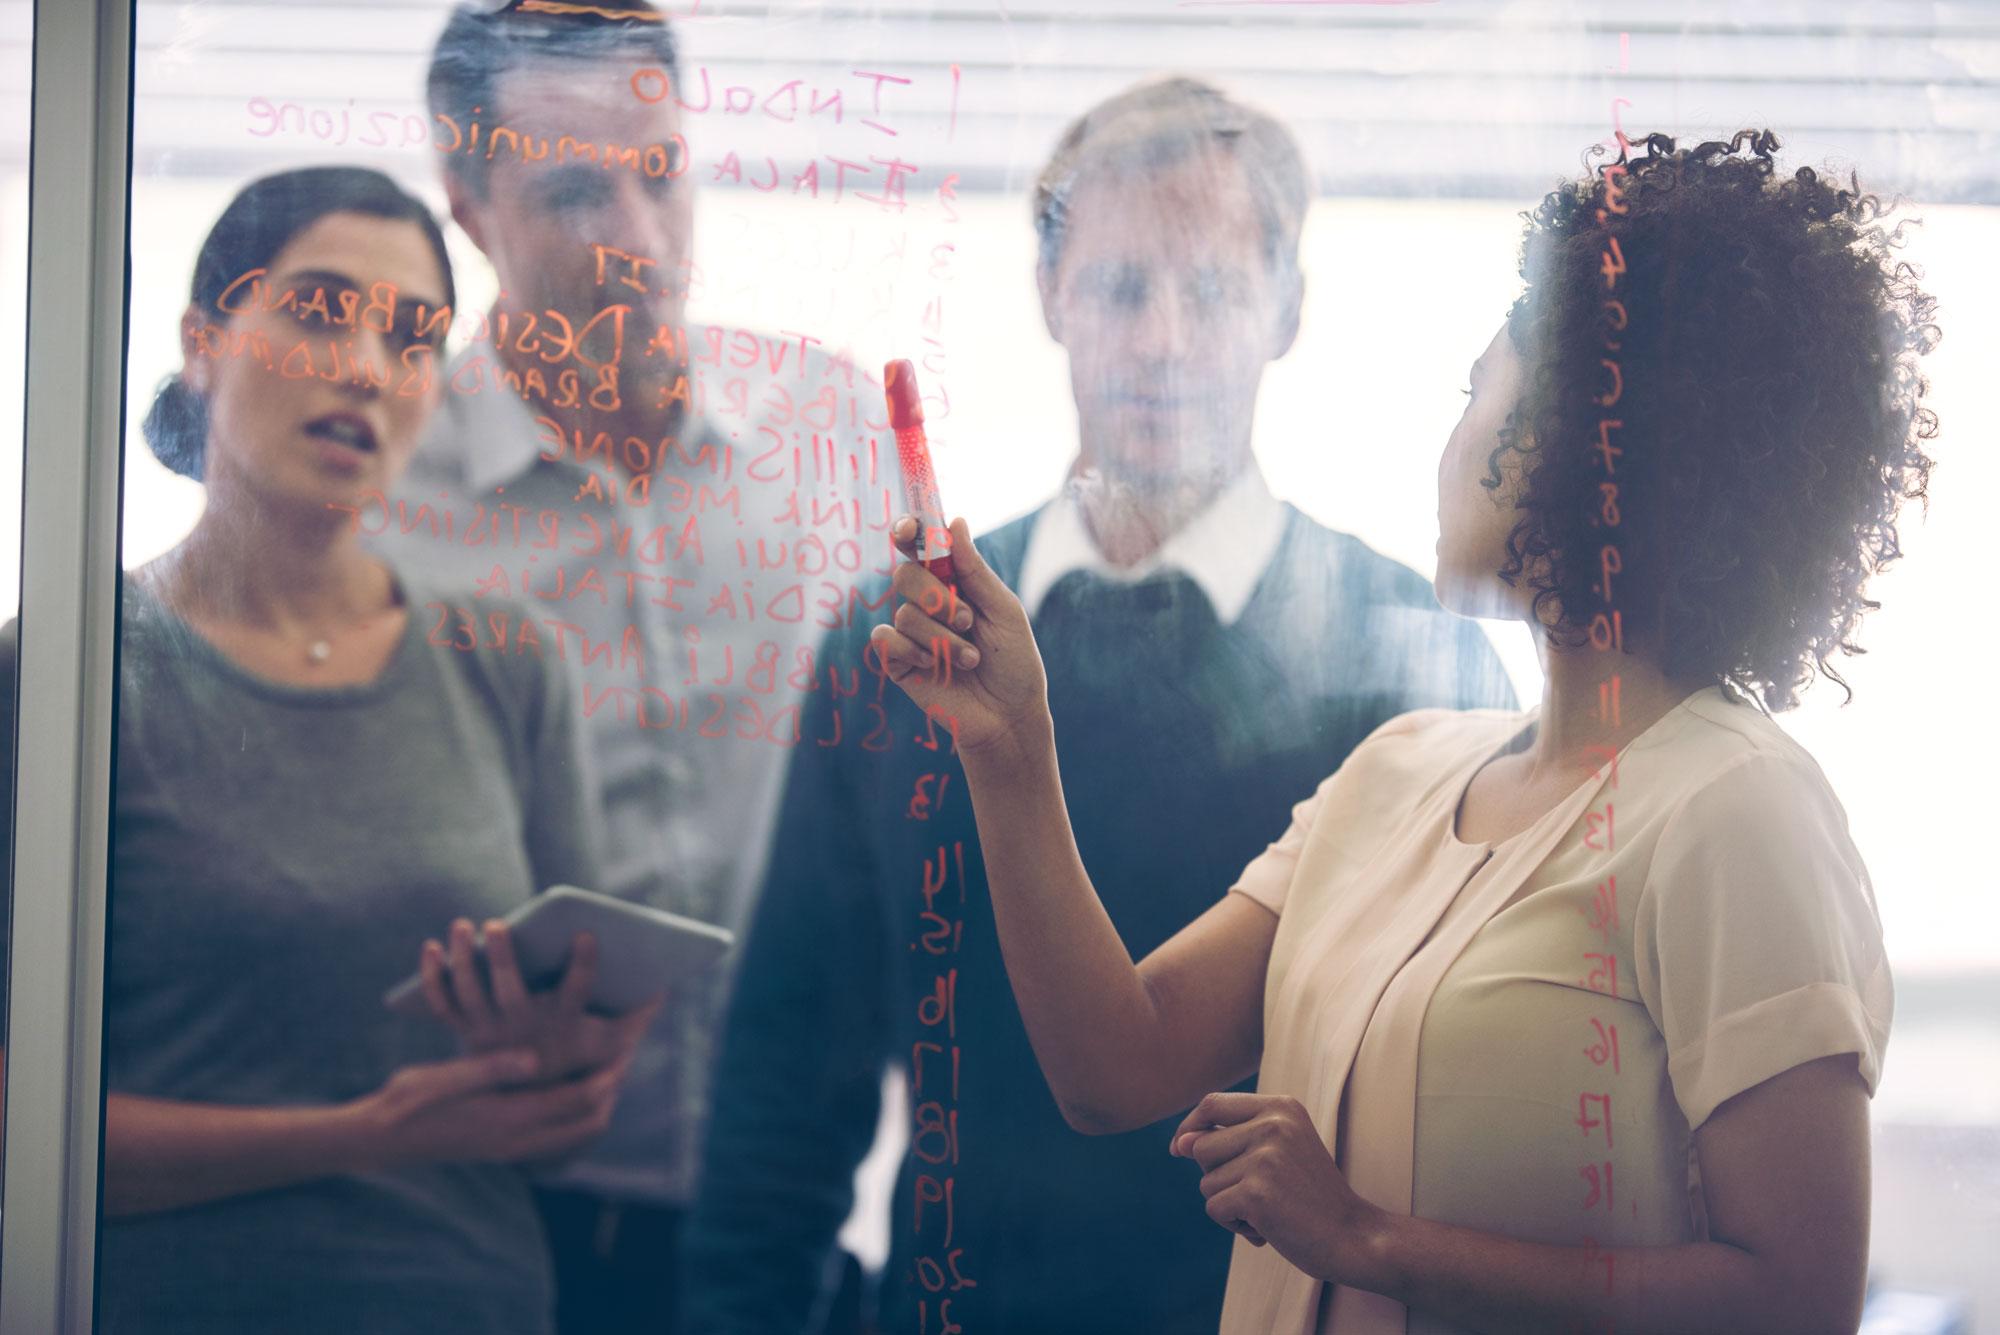 Collaborative Teamwork —   A multi-disciplined team approach makes short work of tall assignments.    Meet Our Team